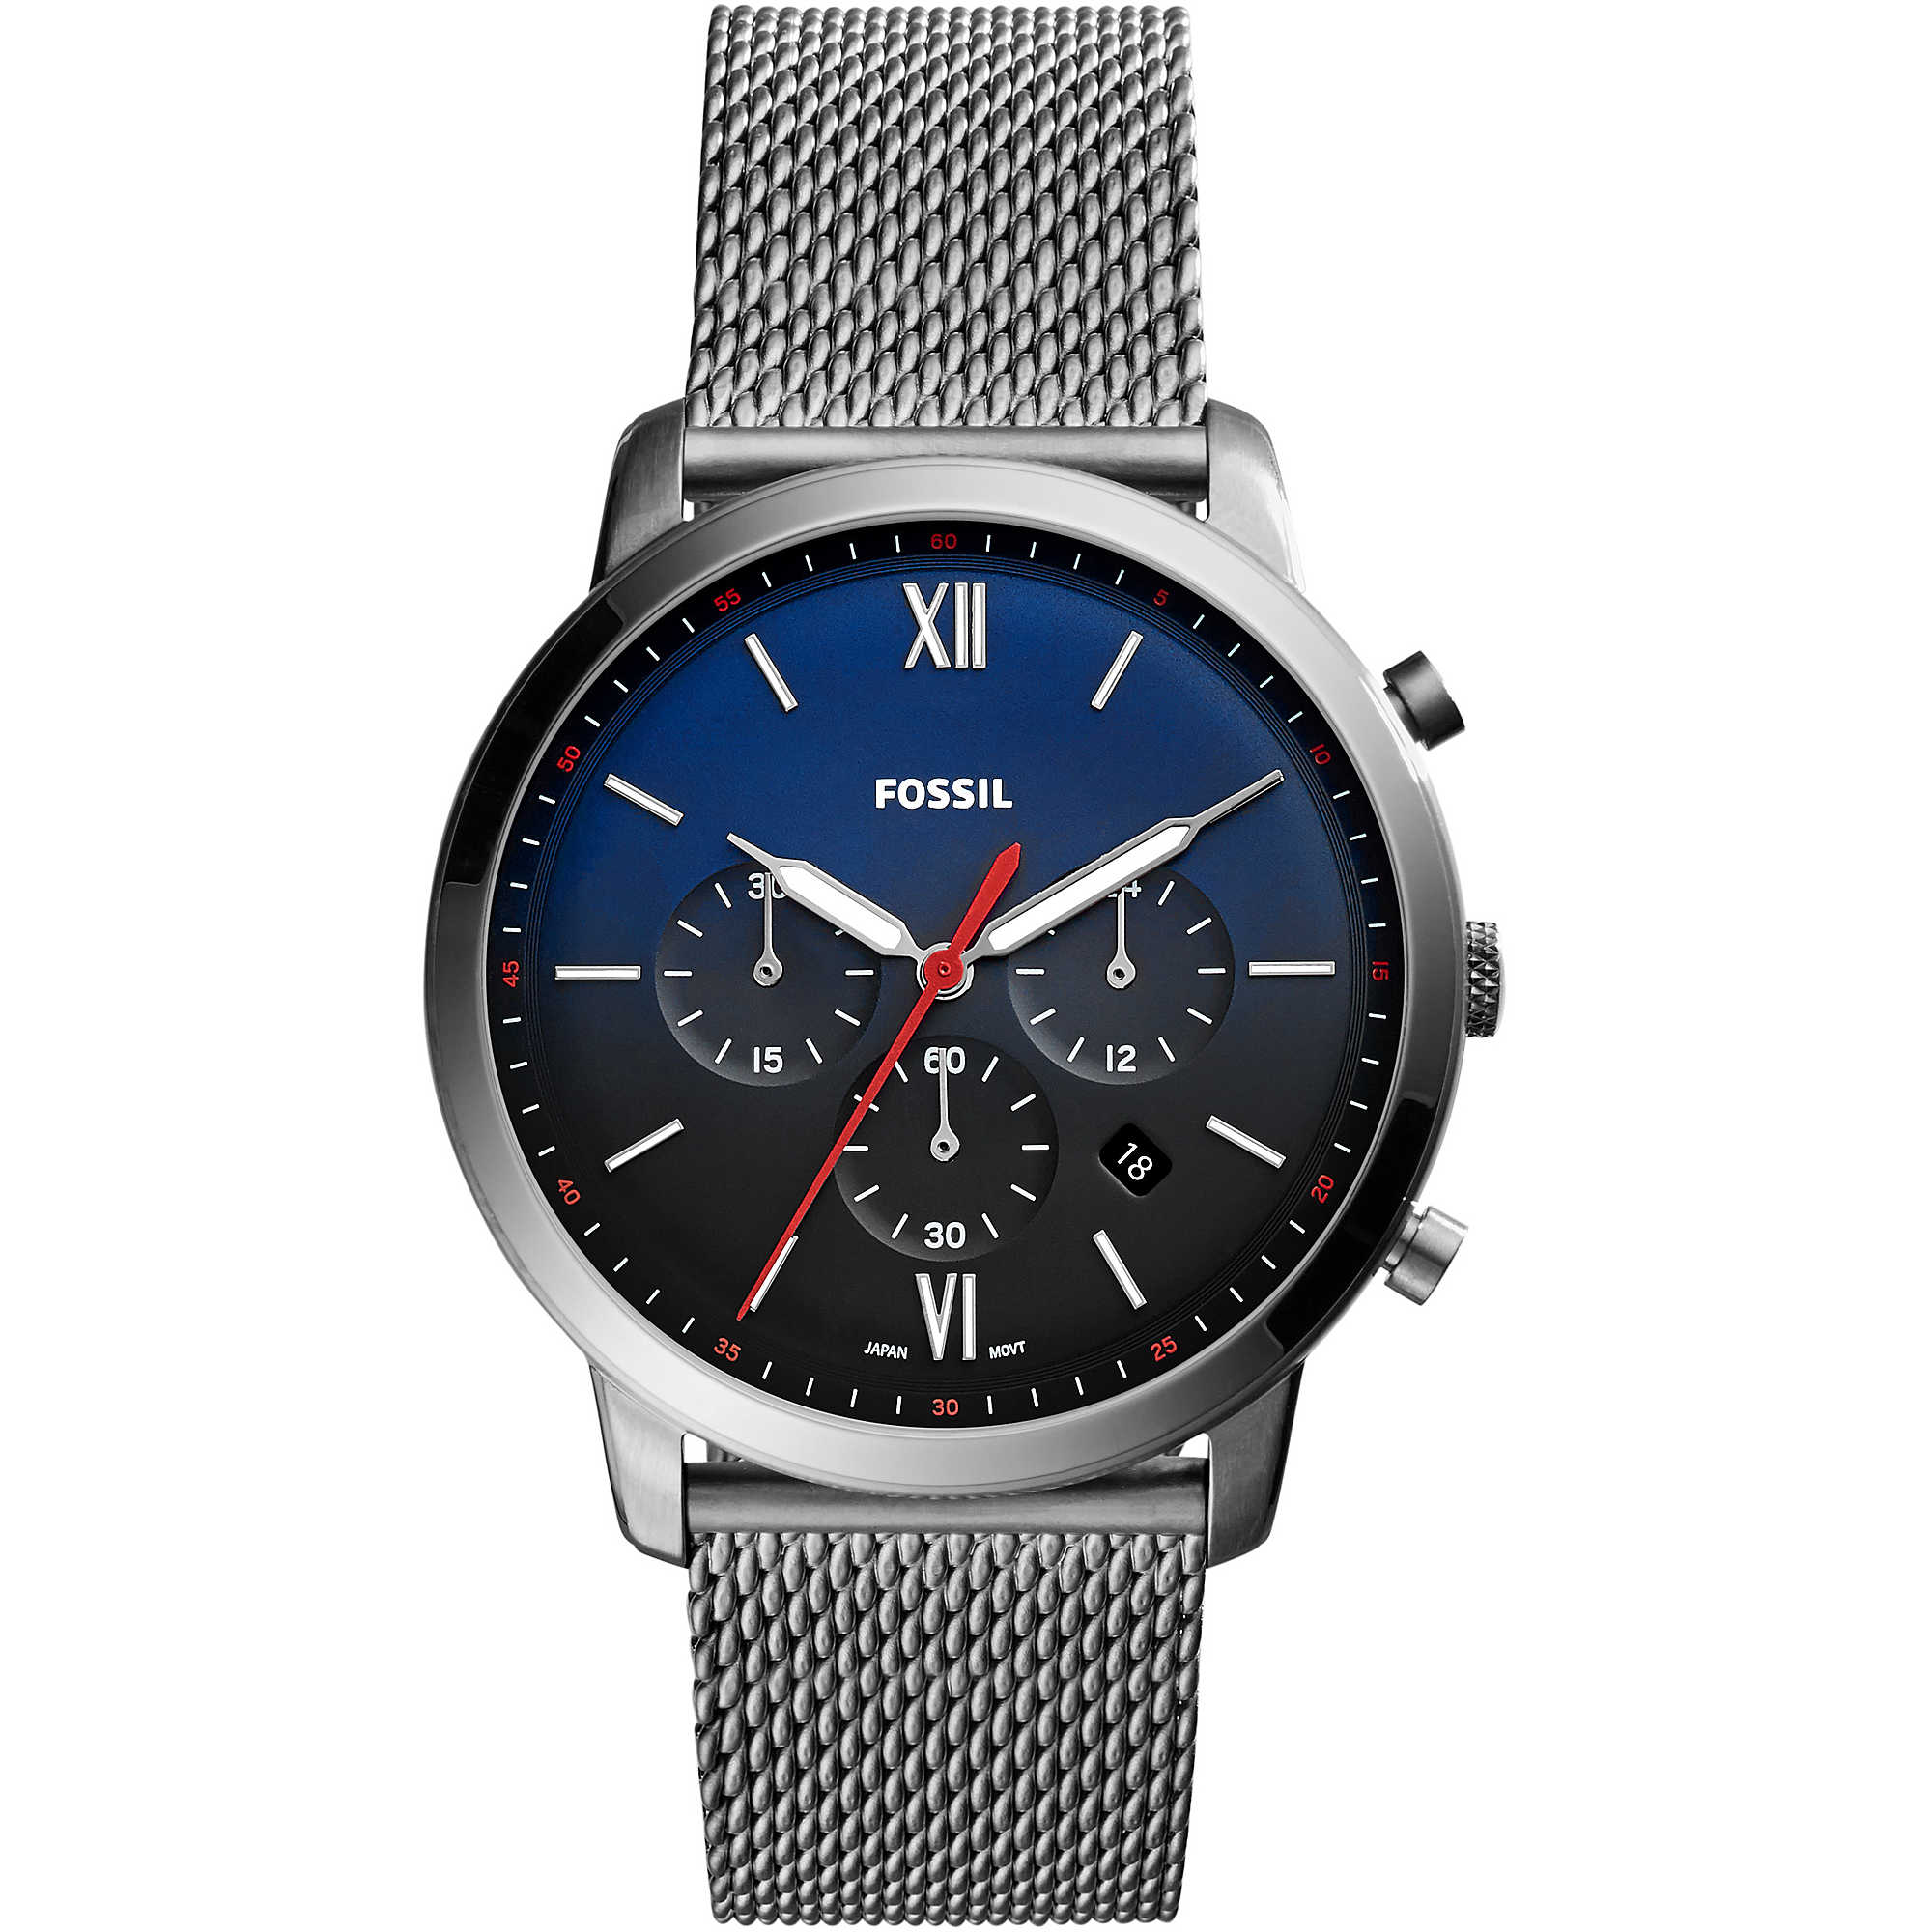 baf5fae3175fca orologio cronografo uomo Fossil Neutra Chrono FS5383 cronografi Fossil